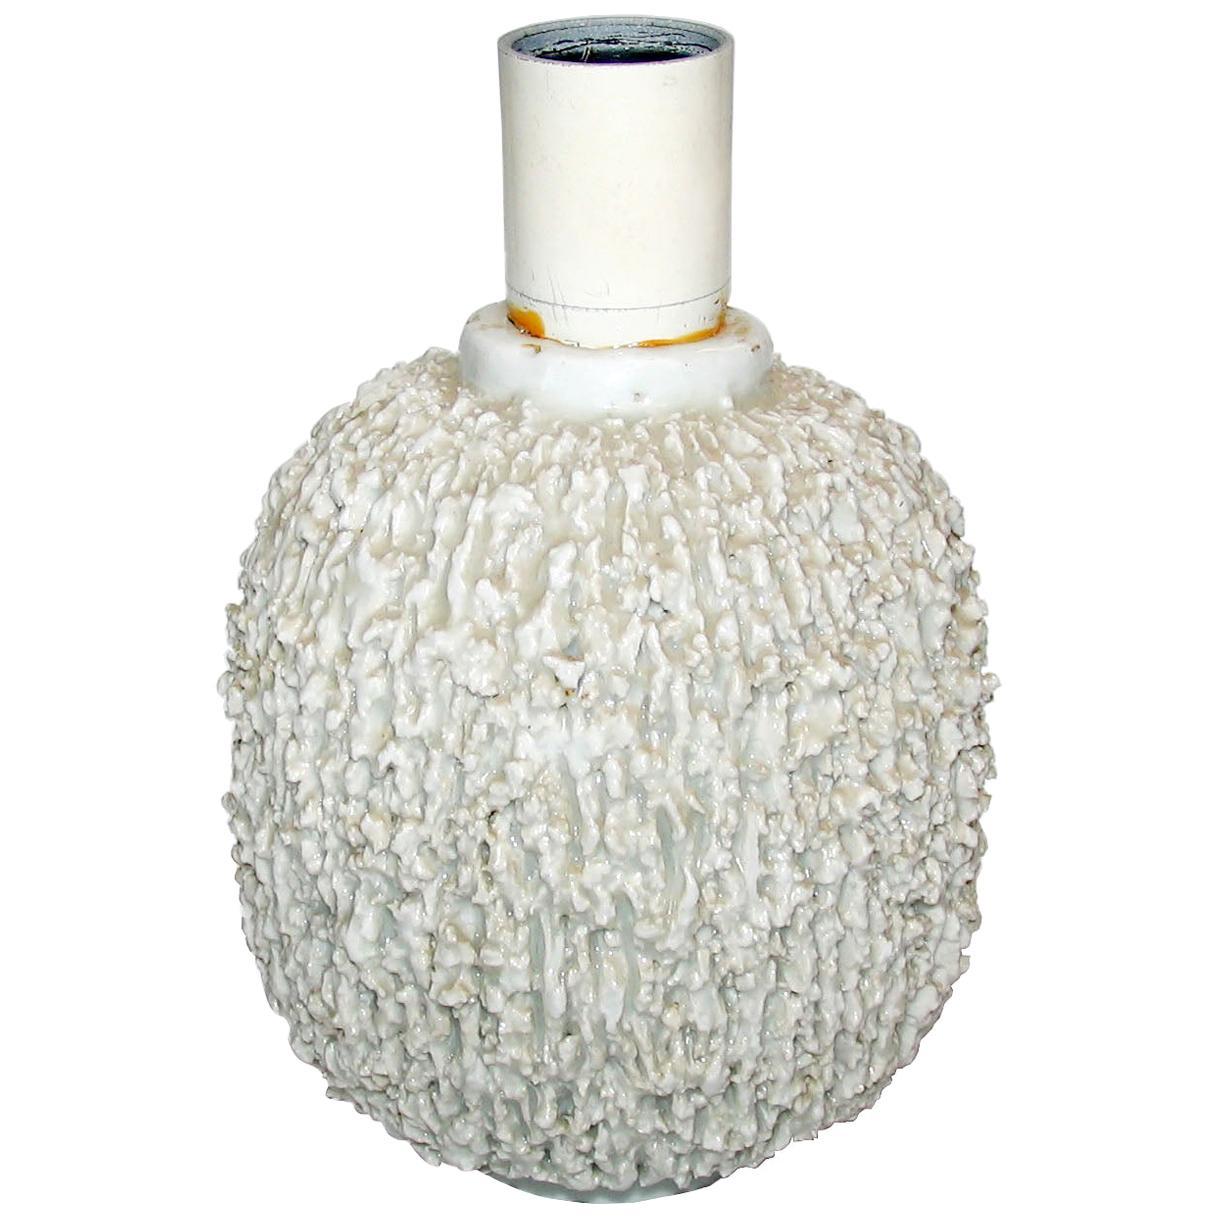 Midcentury Scandinavian Ceramic Chamotte Table Lamp by Gunnar Nylund